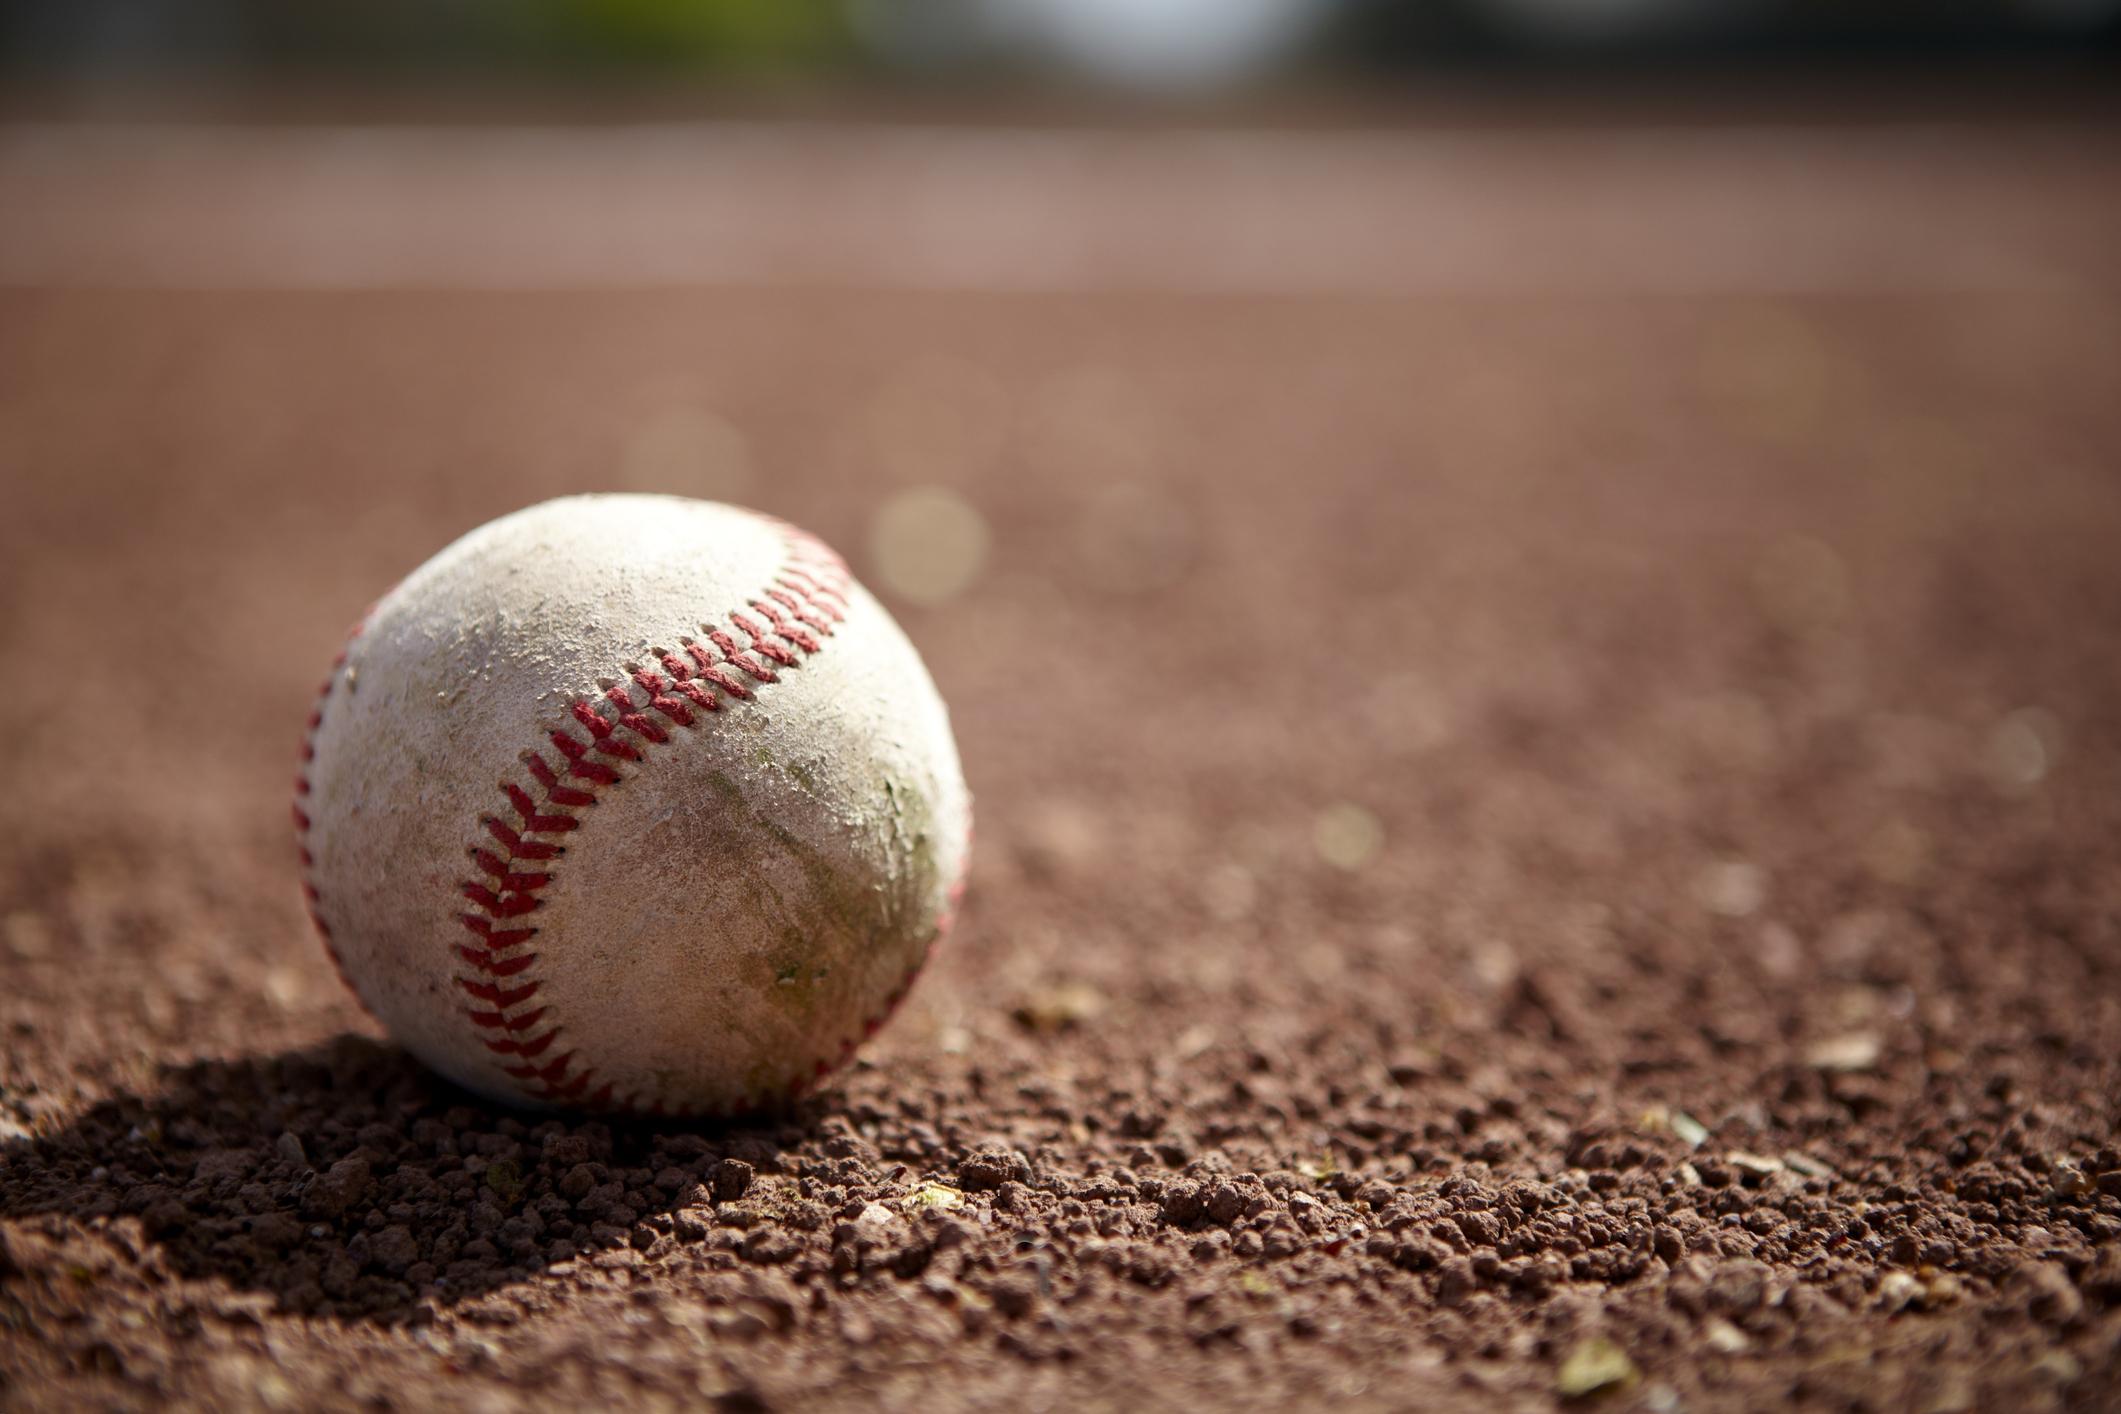 Still life of a baseball on baseball diamond